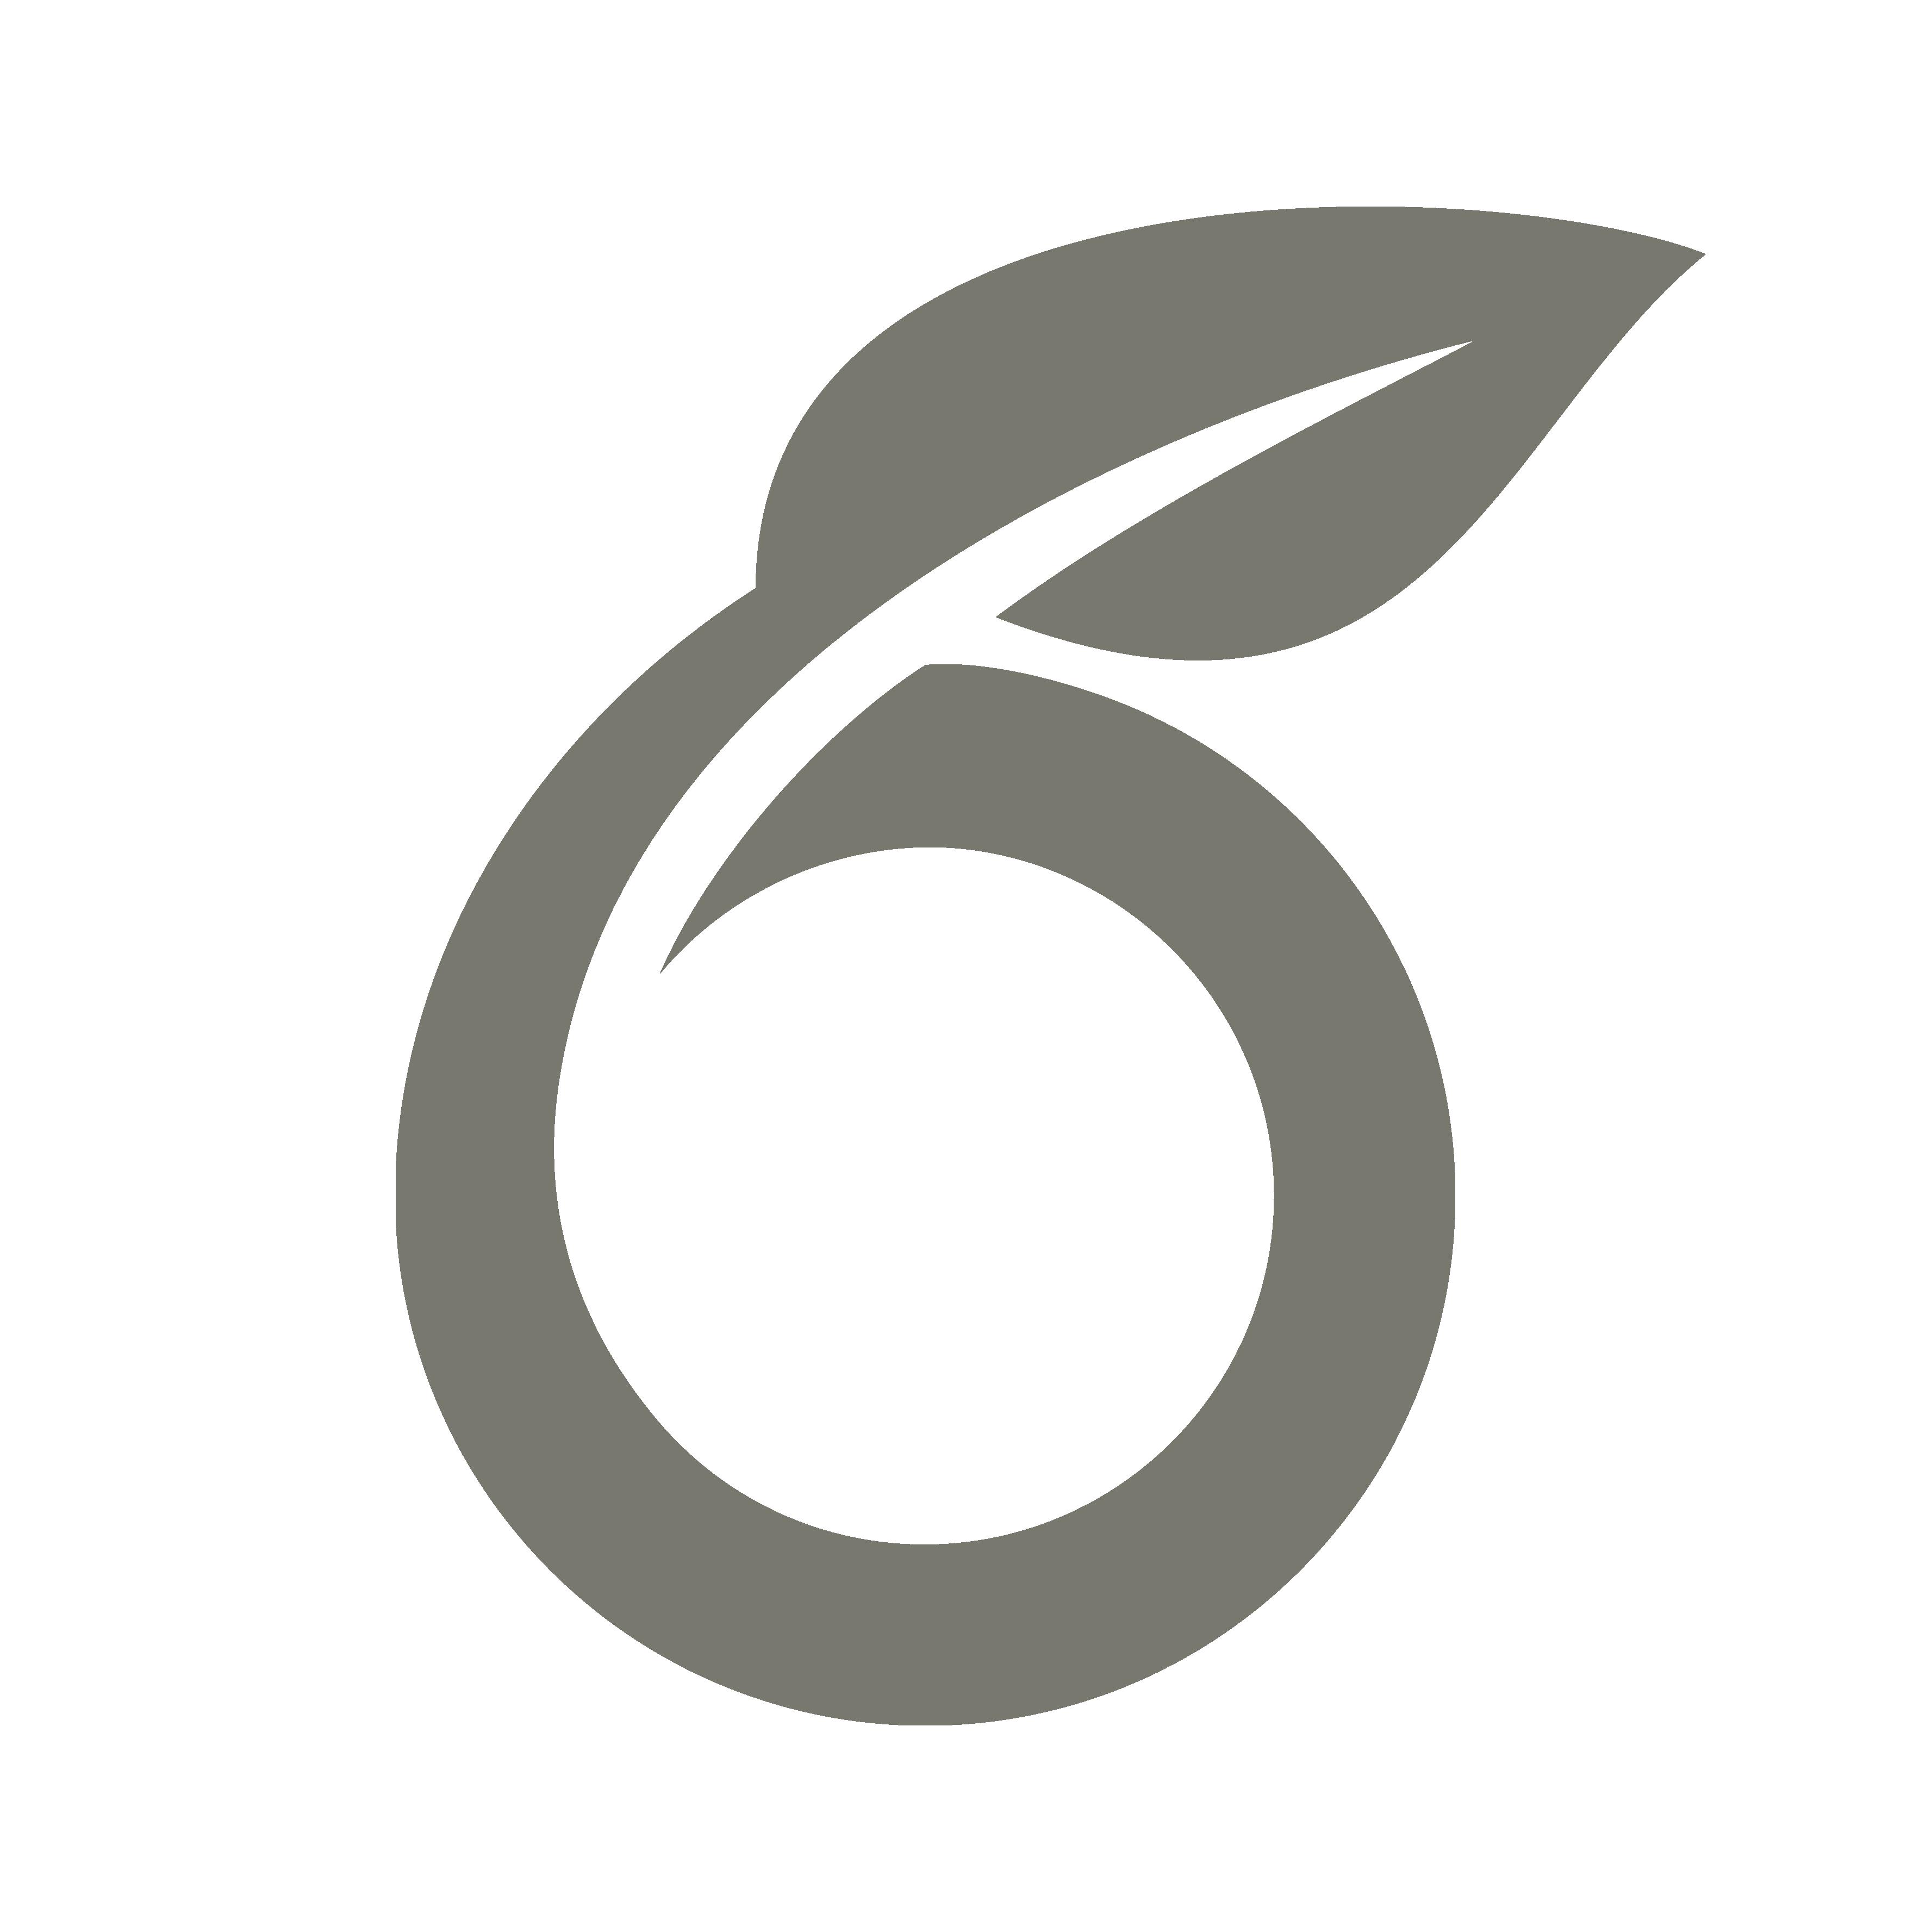 Overleaf Official Logos Overleaf Editor Latex Online